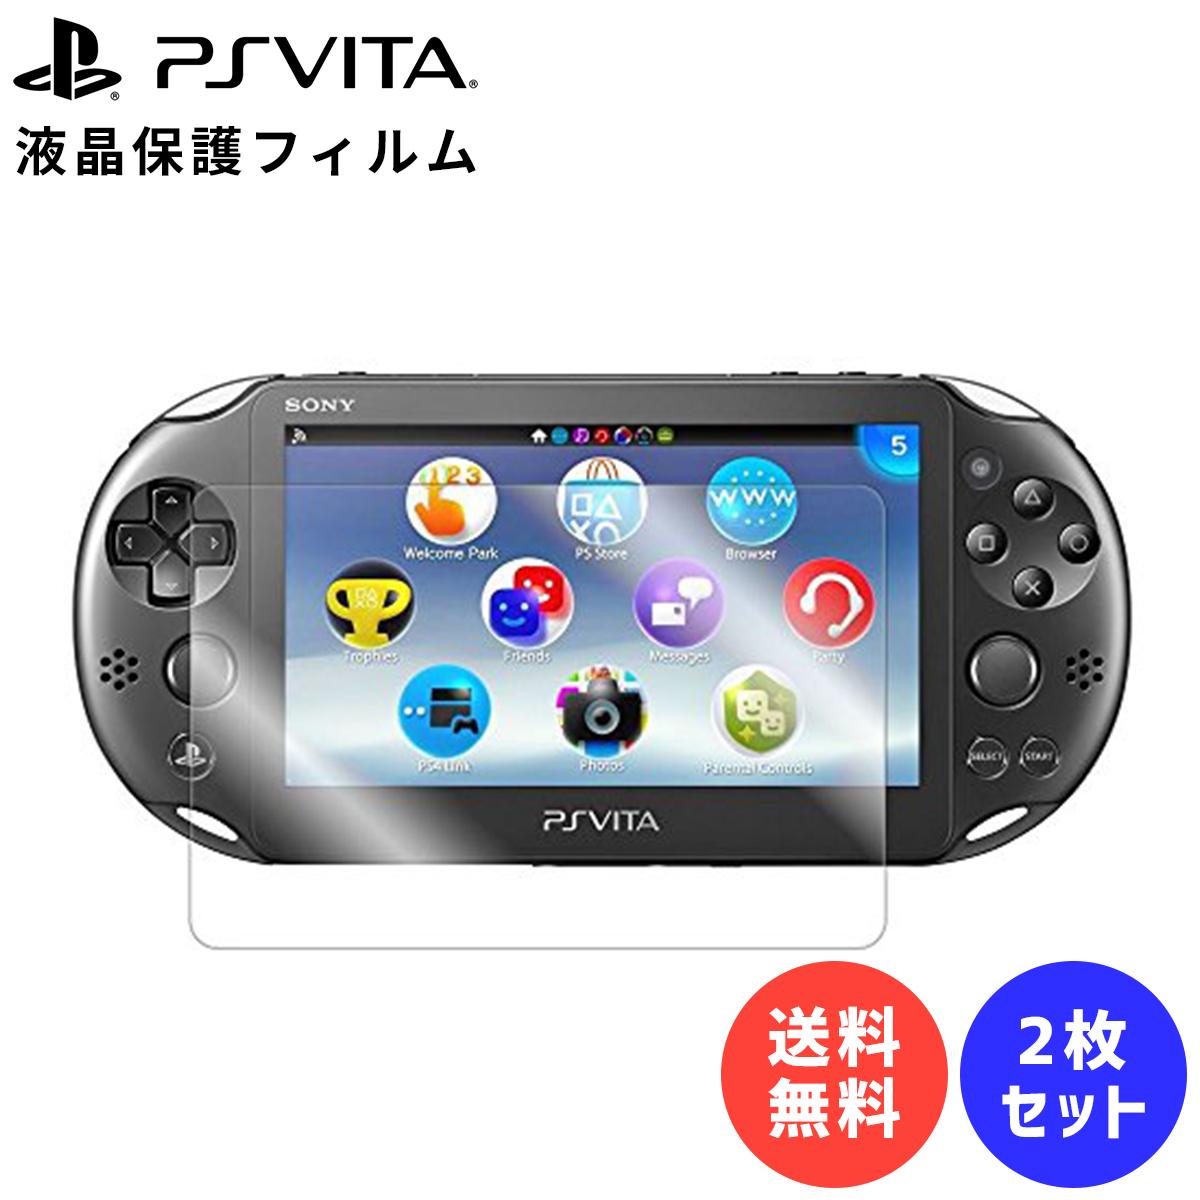 PlayStation Vita フィルム 2枚セット 液晶 画面 保護 PCH-1000 PCH-2000 対応 自己吸着式 プレイステーション ヴィータ 指紋防止